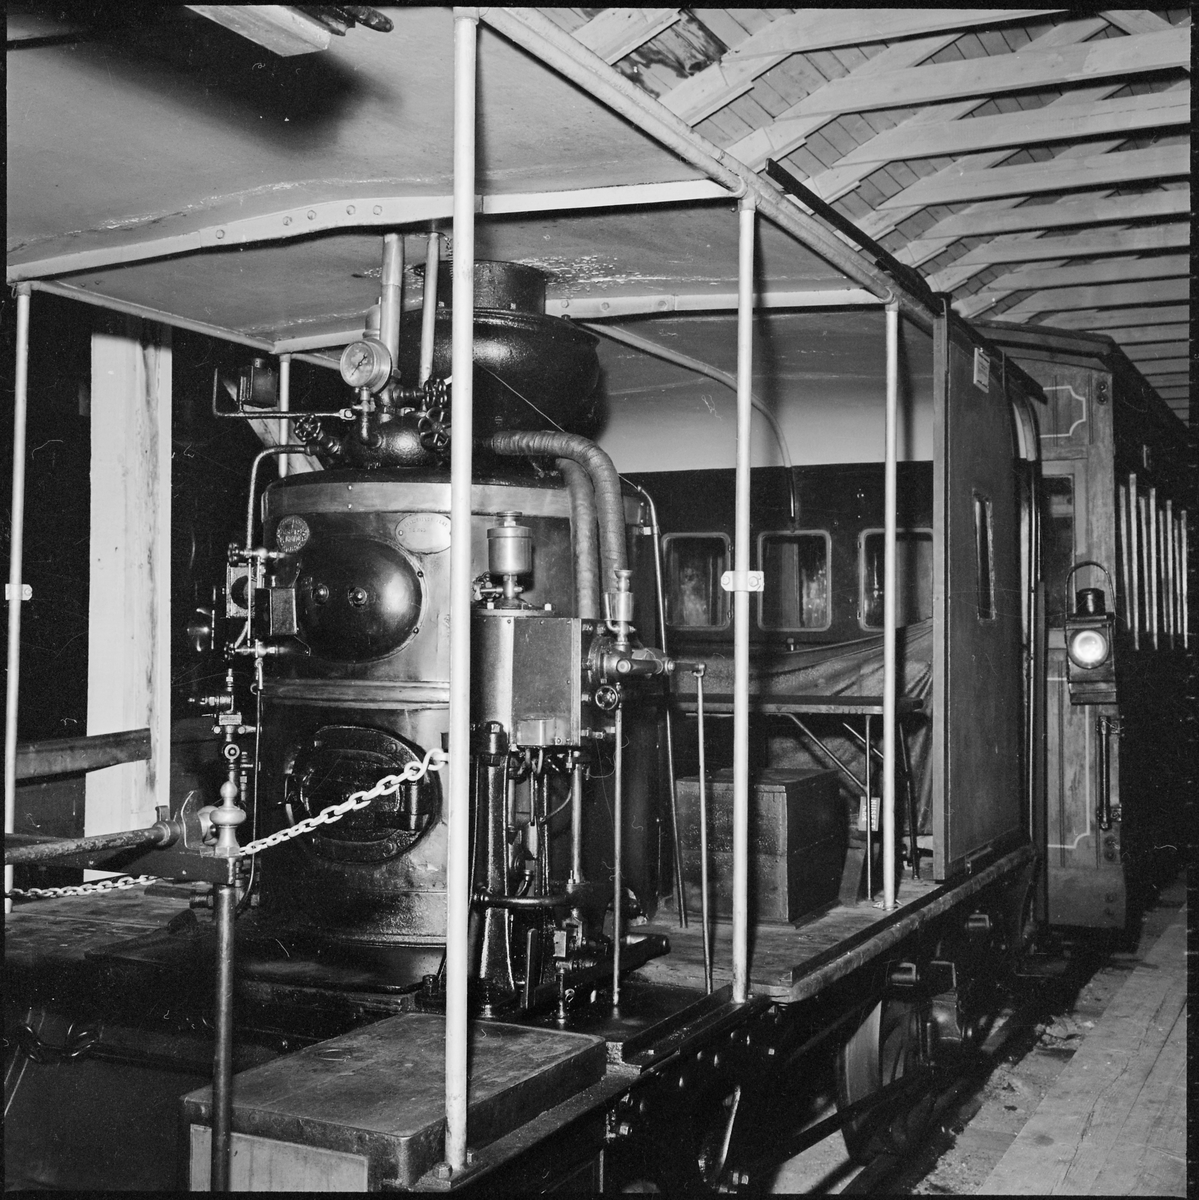 Uddevalla - Vänersborg - Herrljunga Järnväg, UVHJ 1A0Åv. UVHJ's ångvagn i järnvägsmuseums lokaler i Tomteboda.